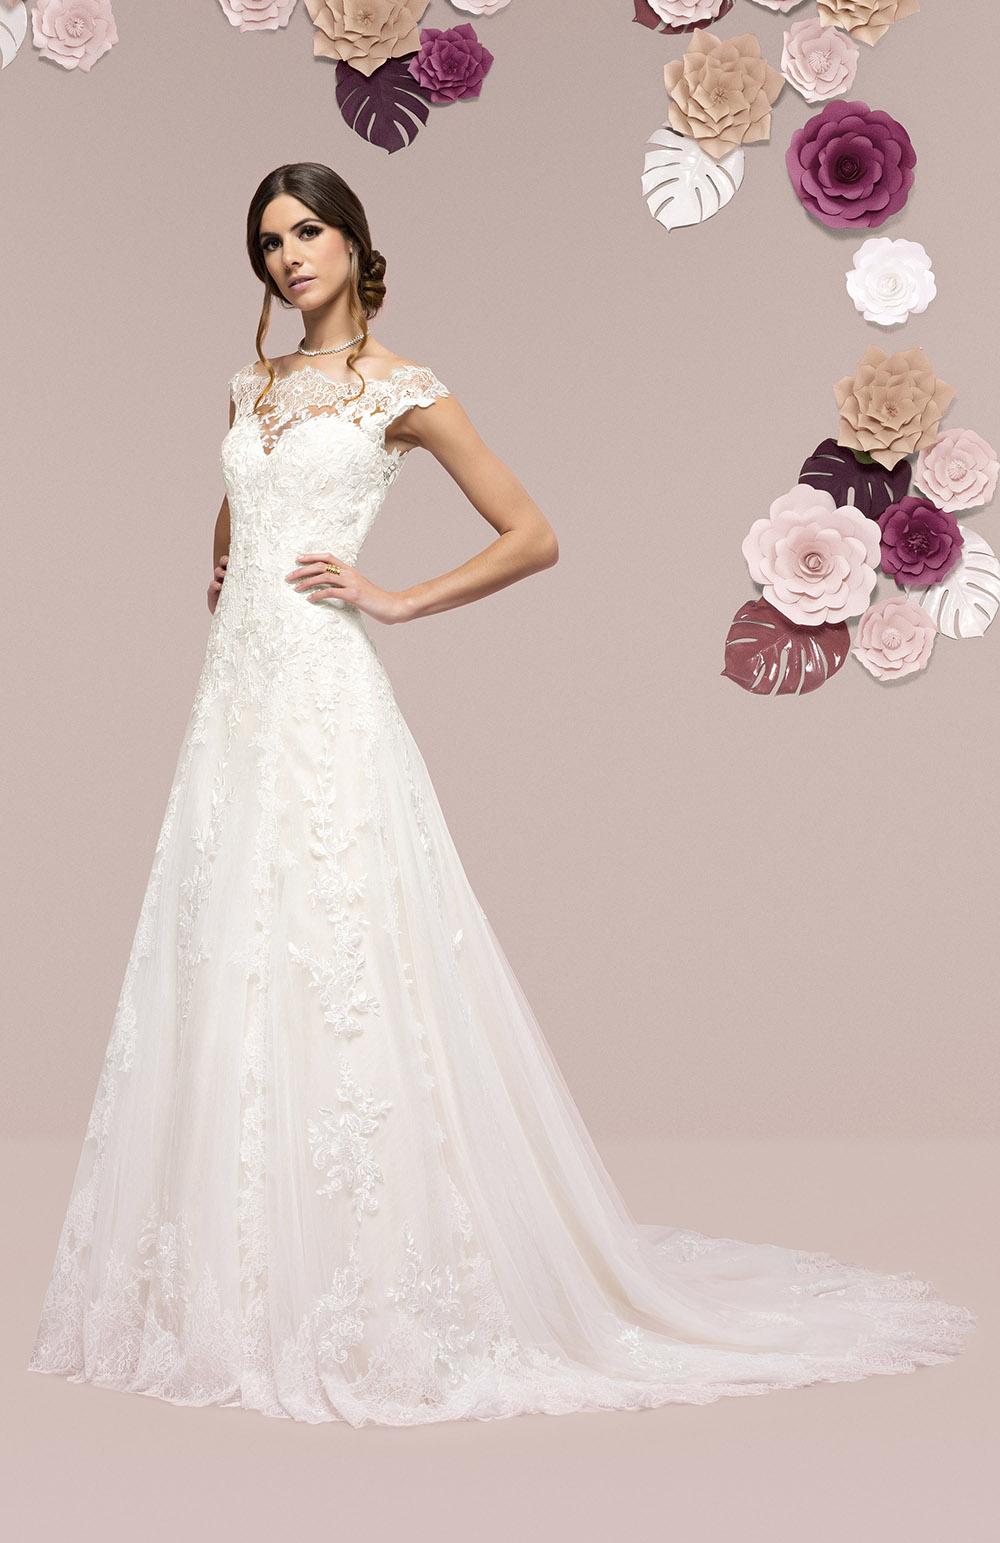 Robe de mariée Modèle Vera